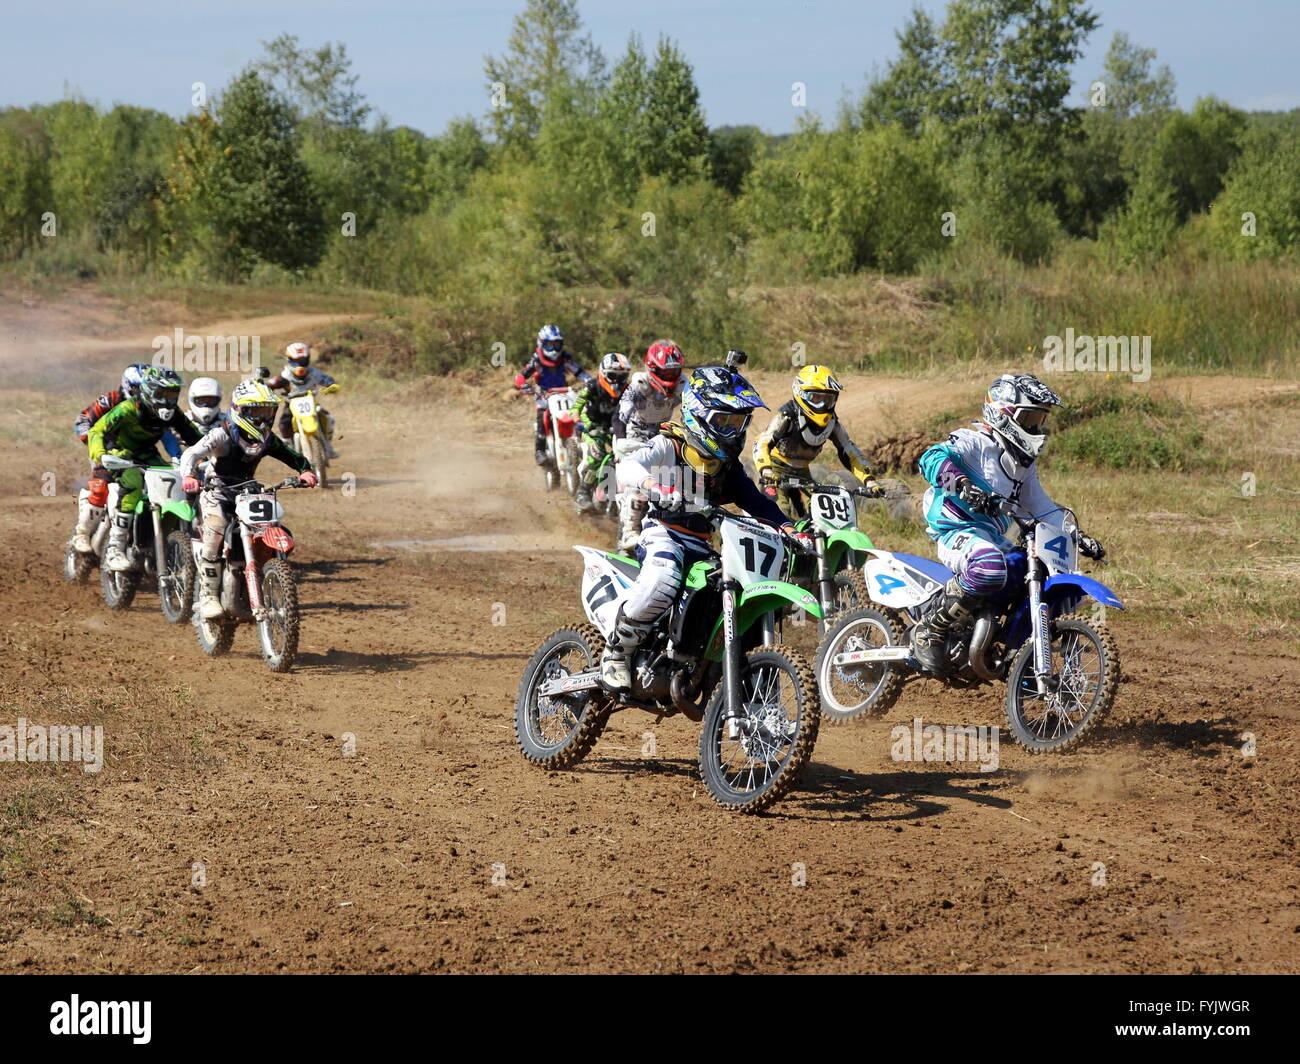 ARSENYEV, RUSSIA - AUG 30: Rider participates in the  round of t - Stock Image